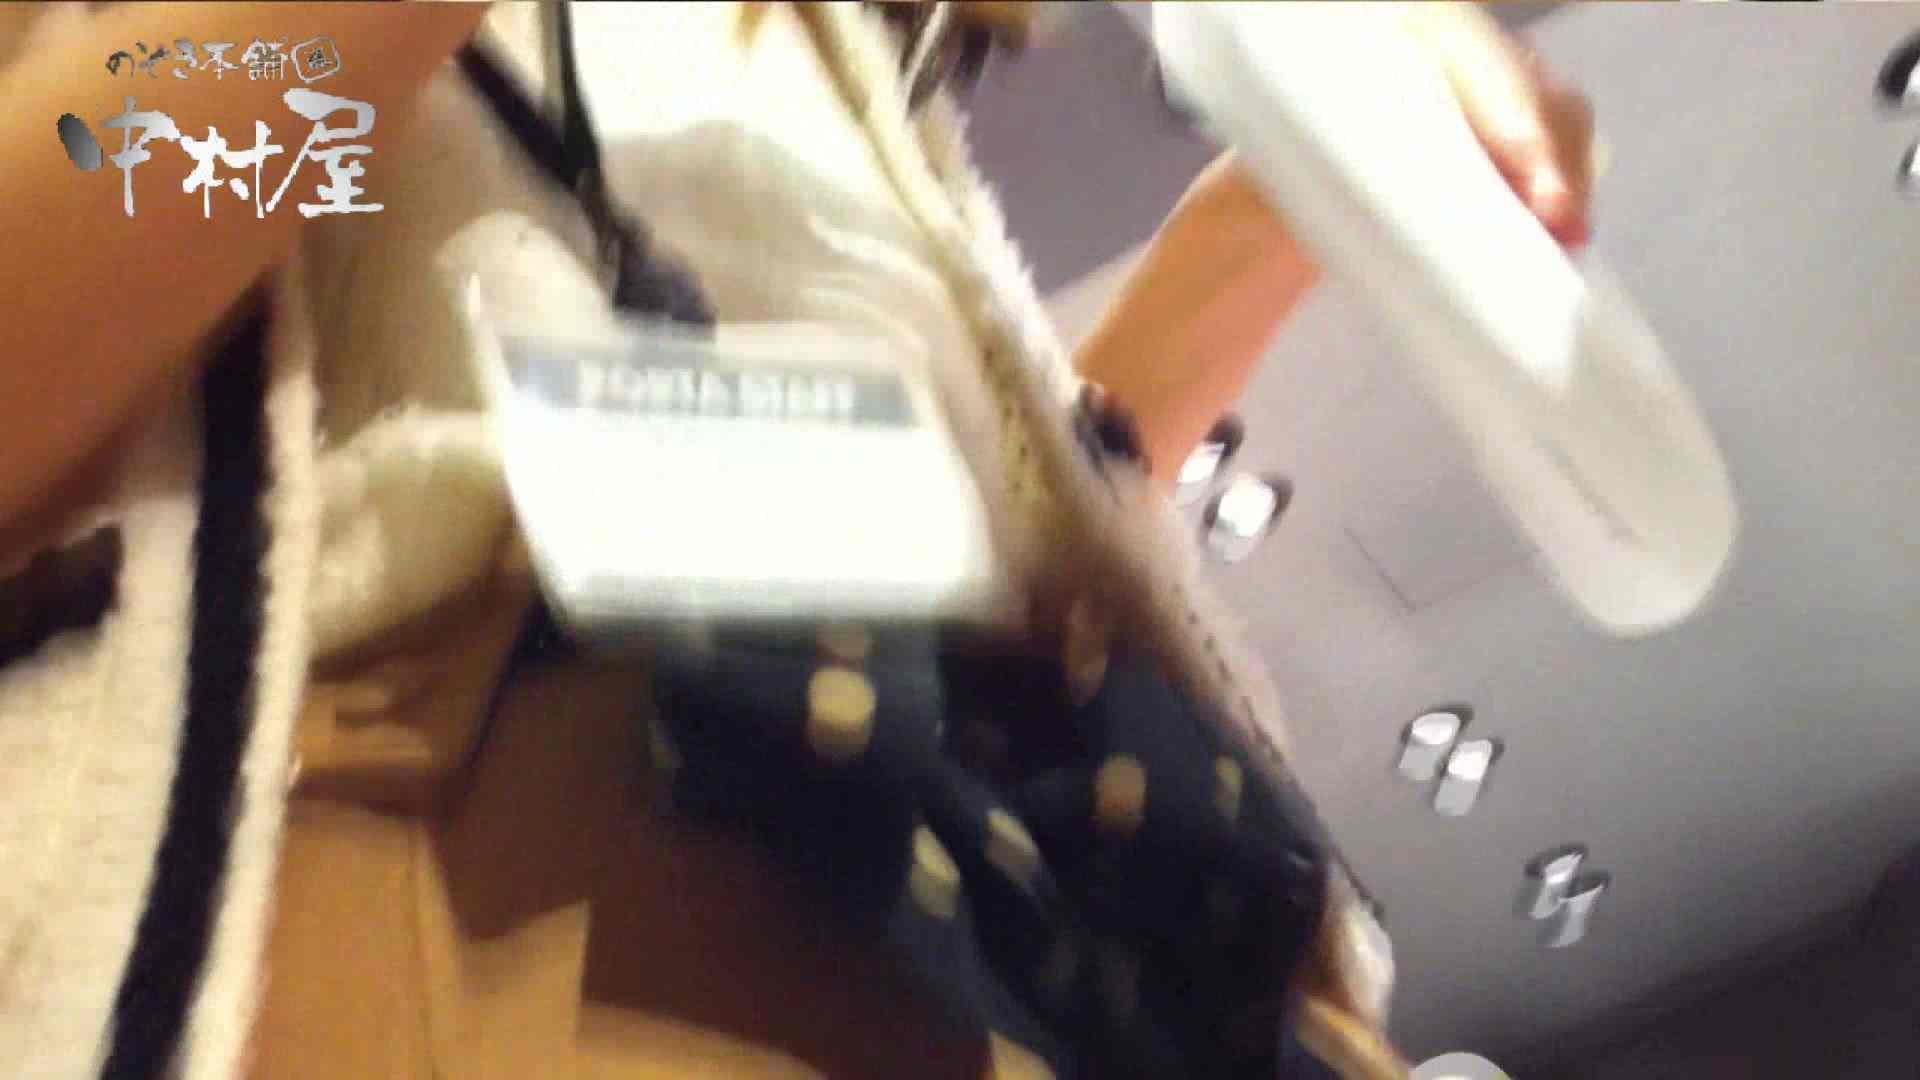 vol.48可愛いカリスマ店員胸チラ&パンチラ アニメ声の店員さん 胸チラ  96Pix 55